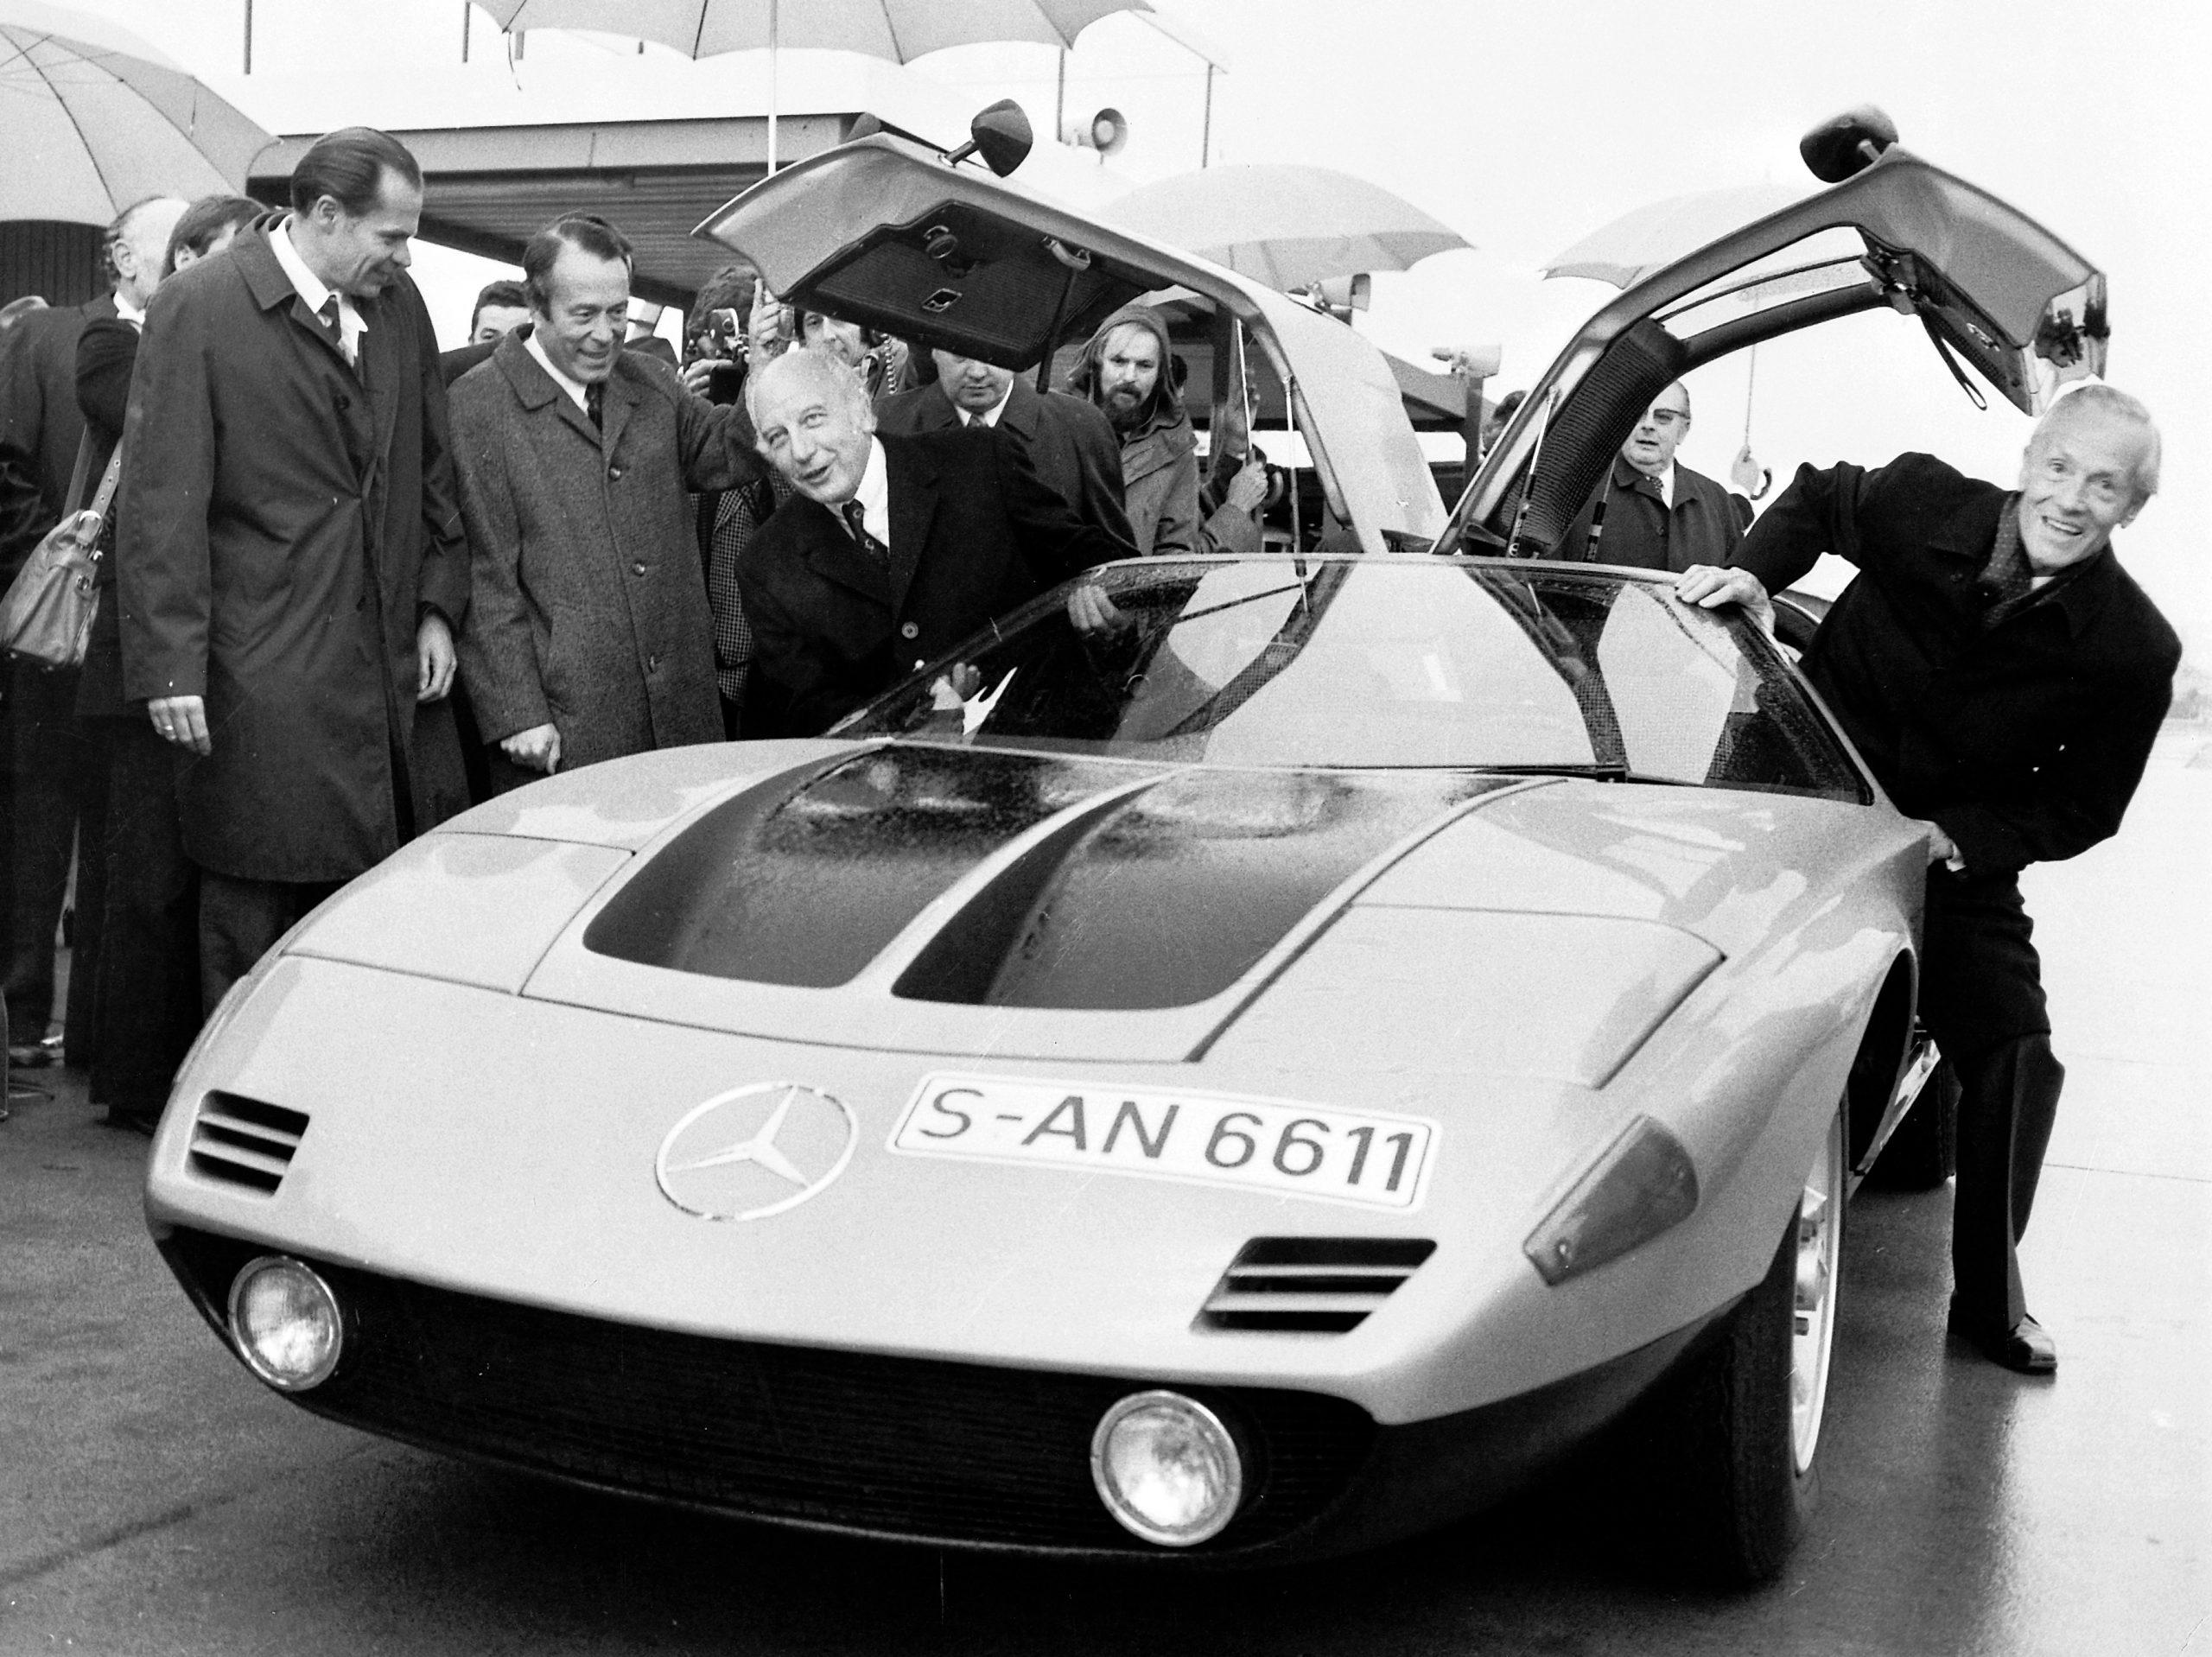 1970 Mercedes-Benz C 111-II with German president 1974